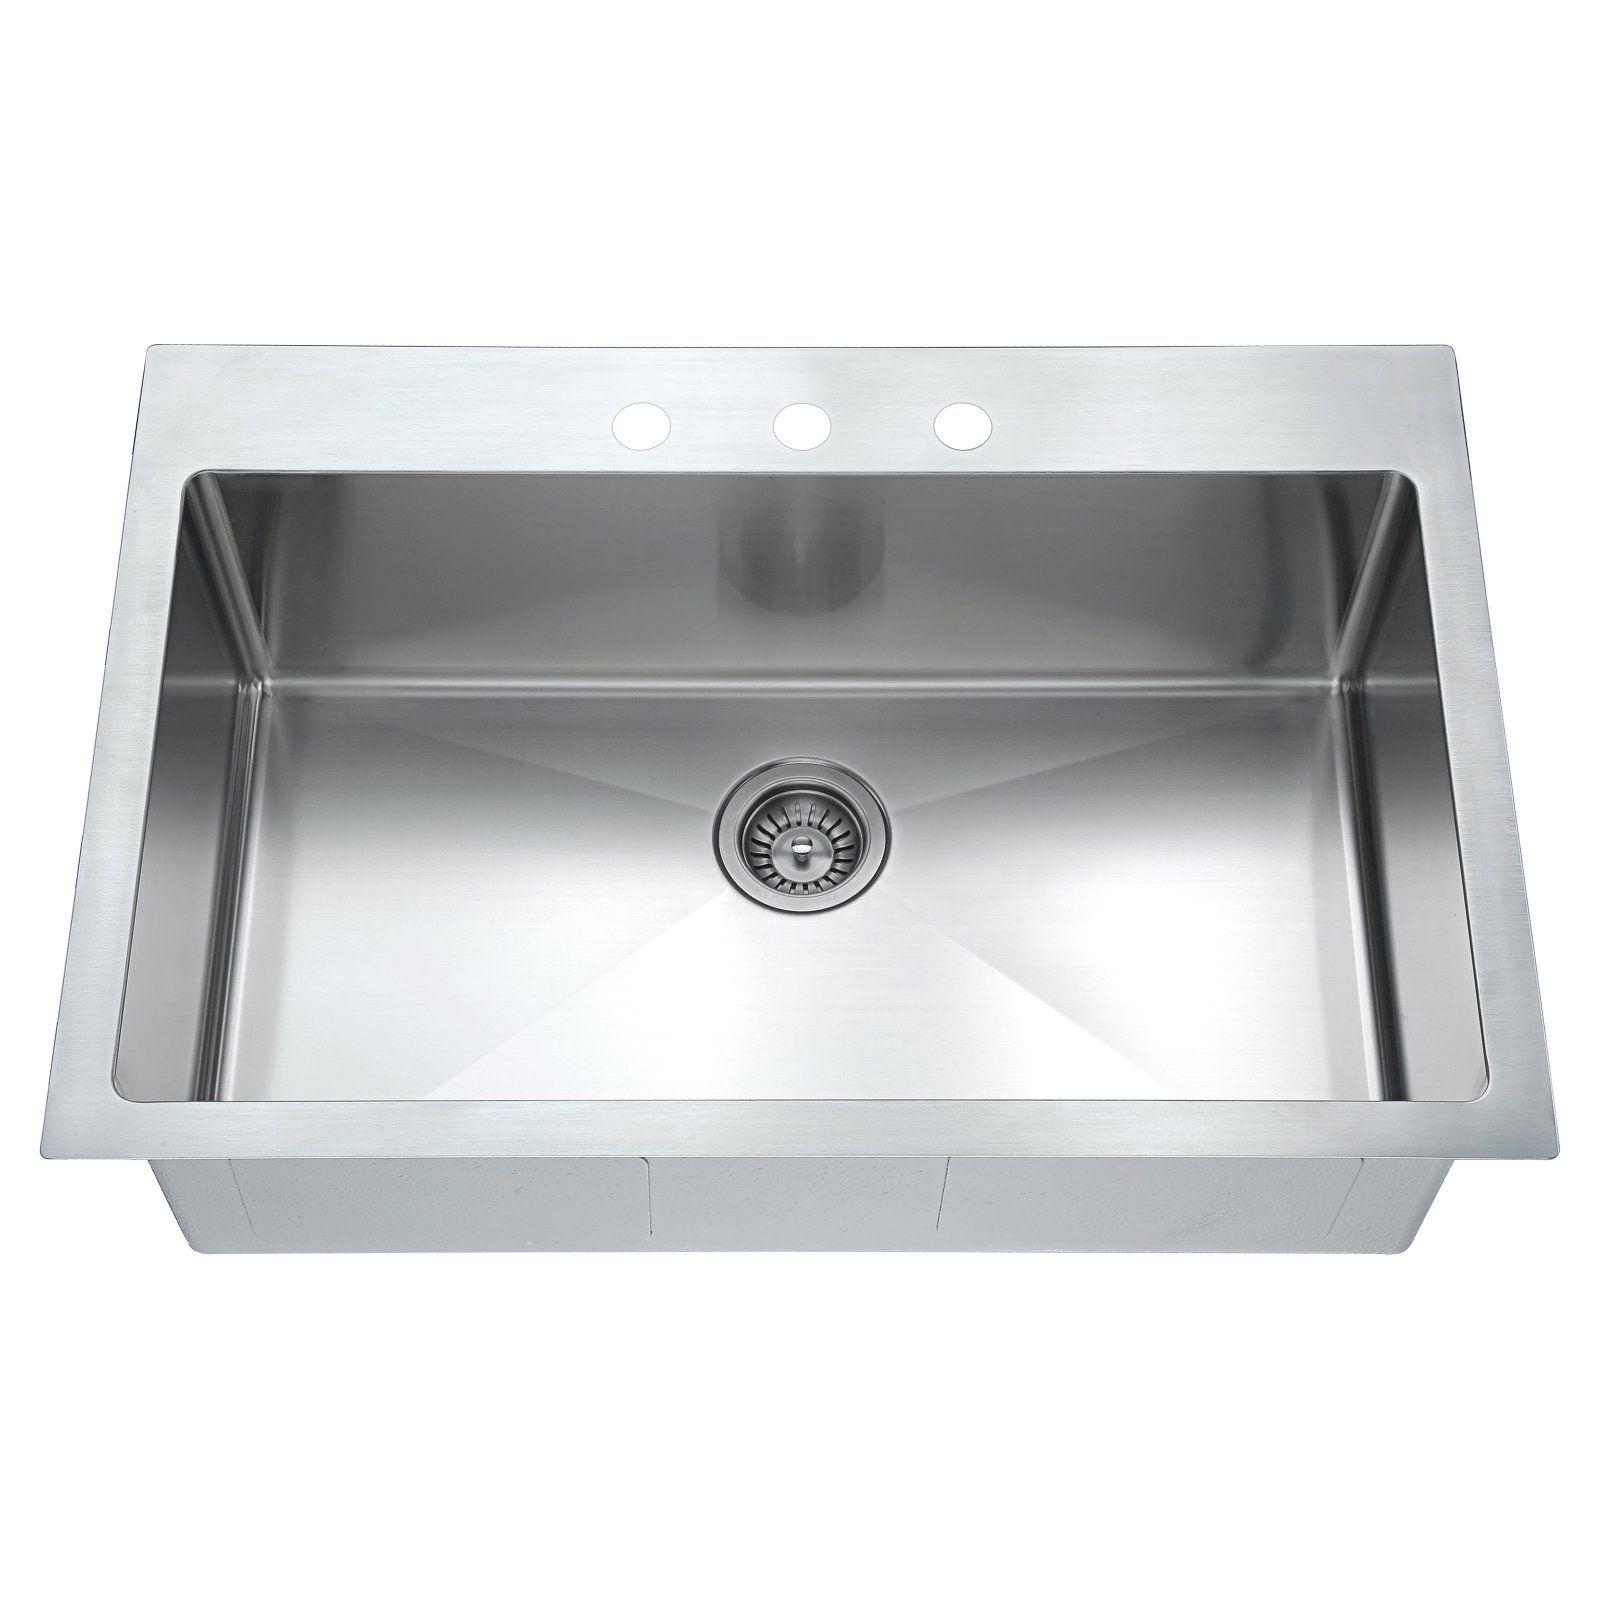 Dawn Ast104 Top Mount Single Bowl Stainless Steel Kitchen Sink